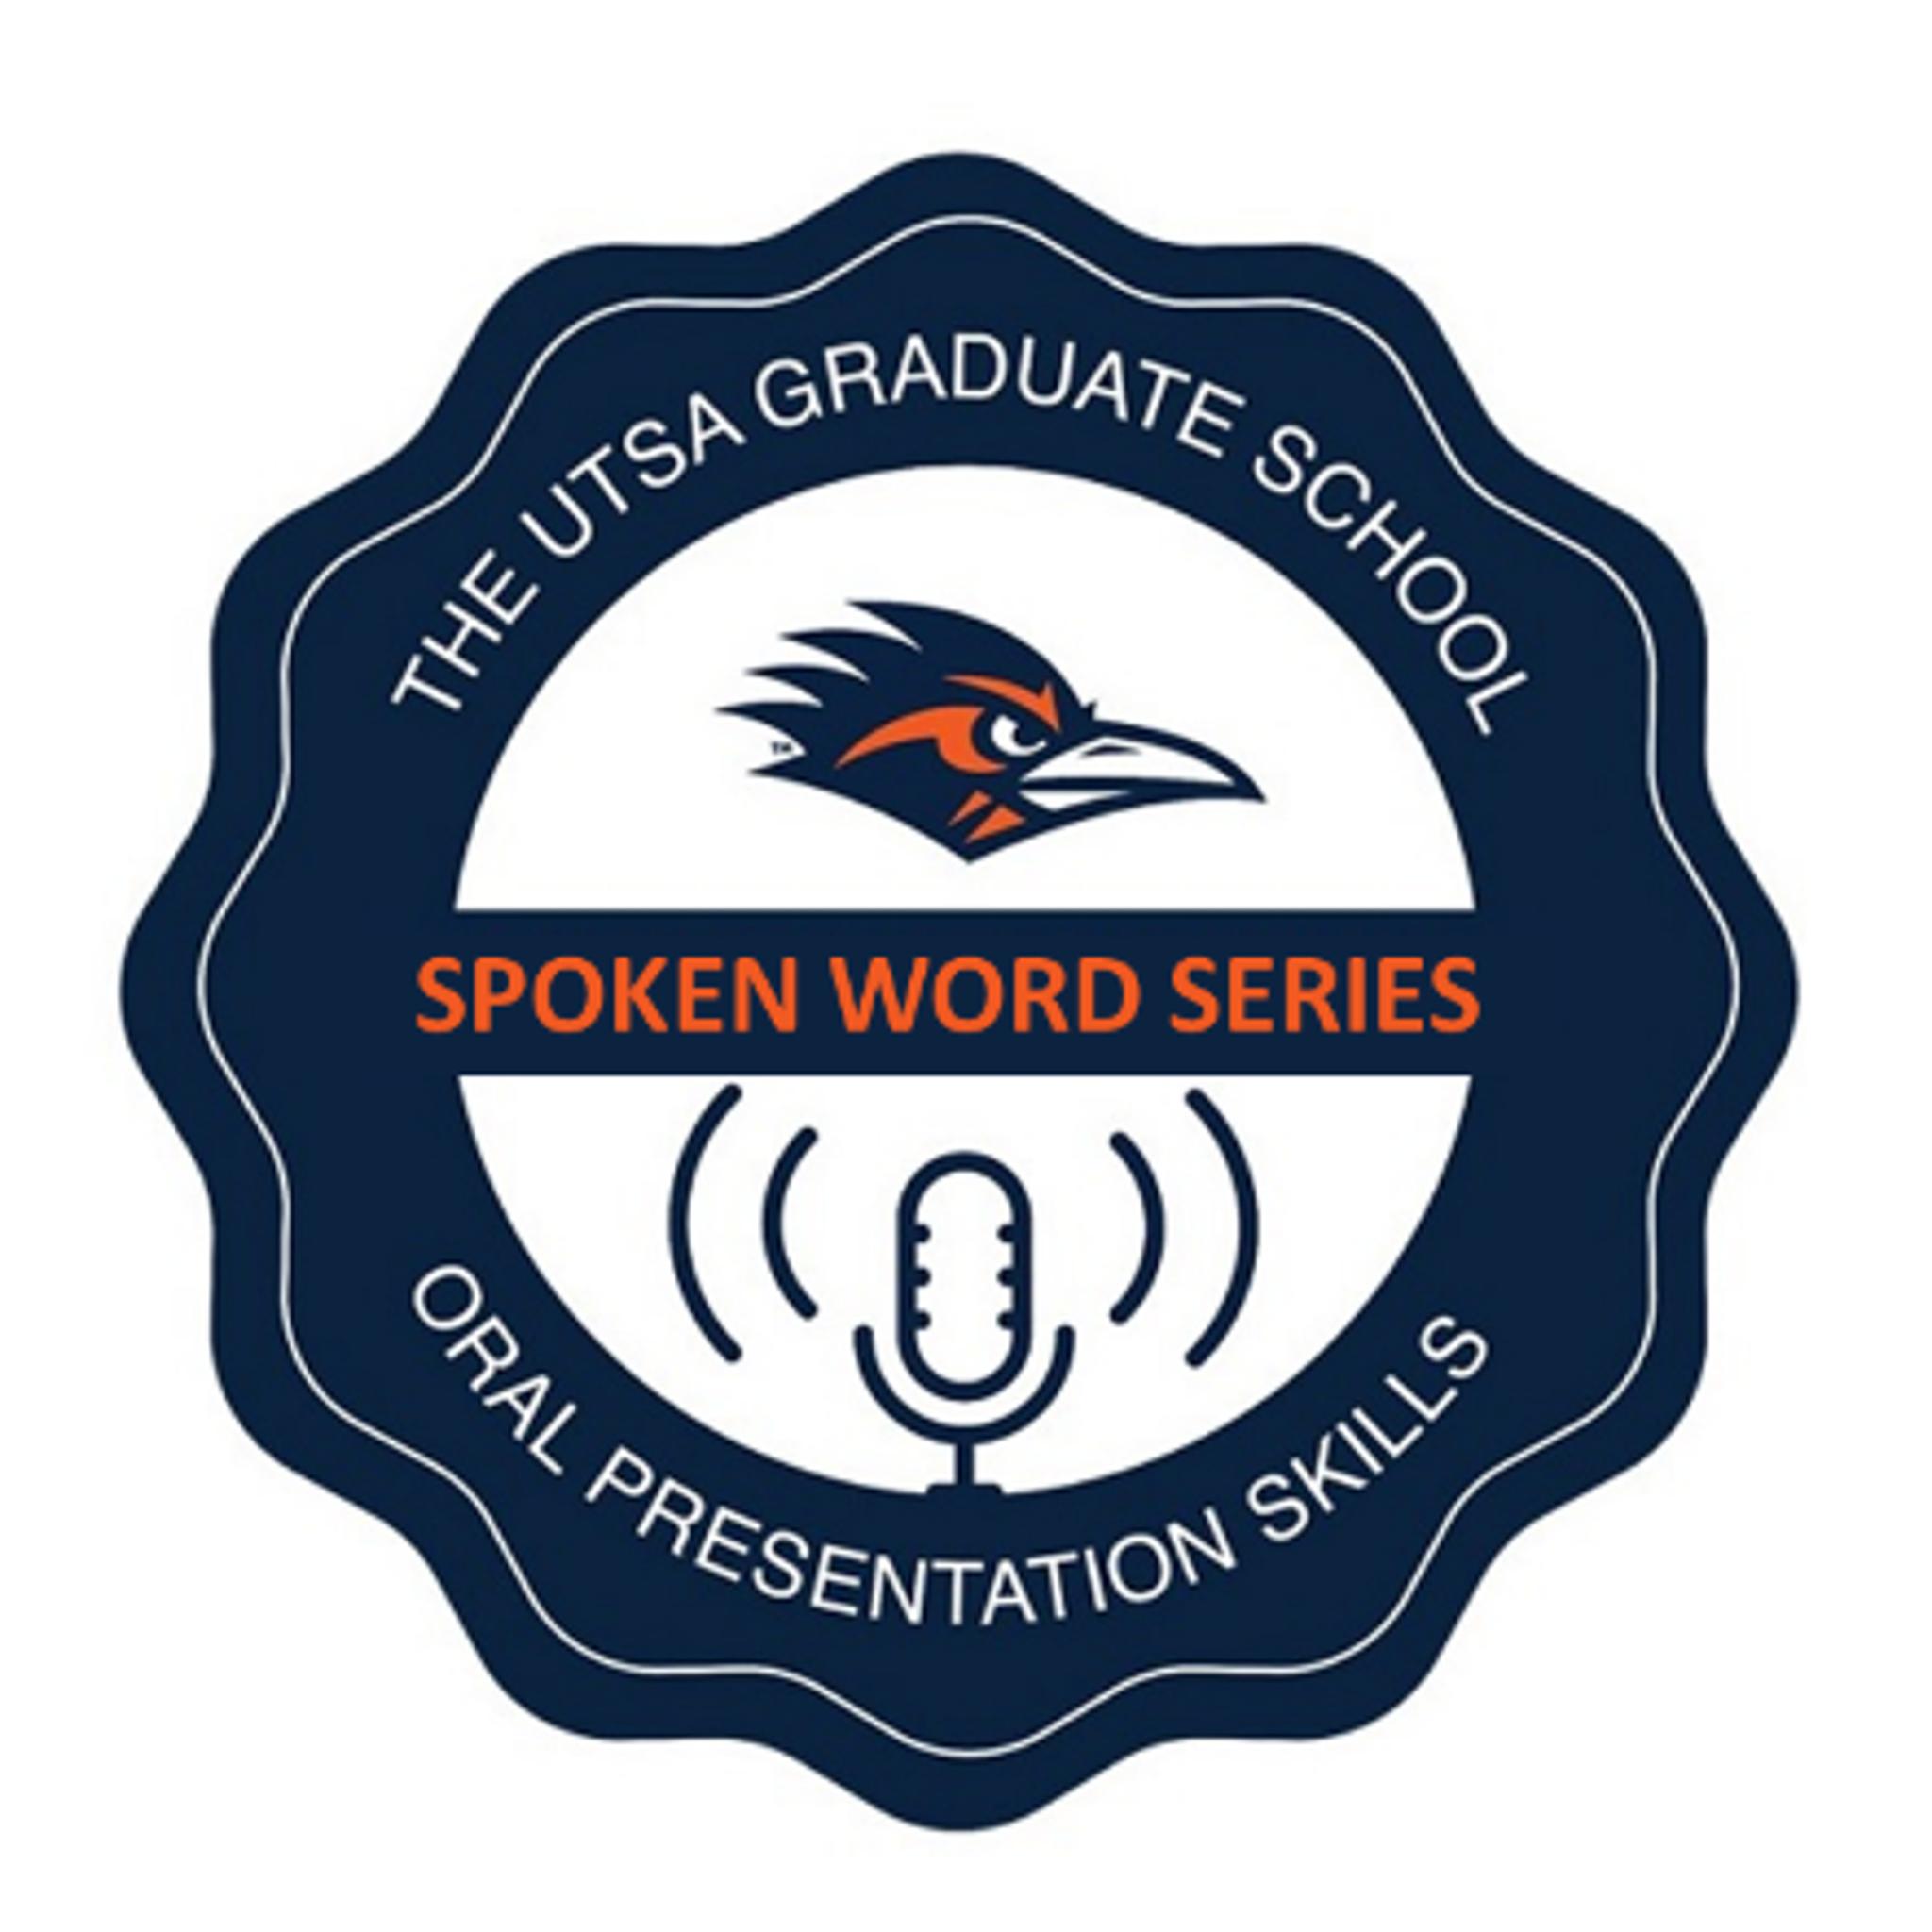 COMMUNICATION: SPOKEN WORD SERIES